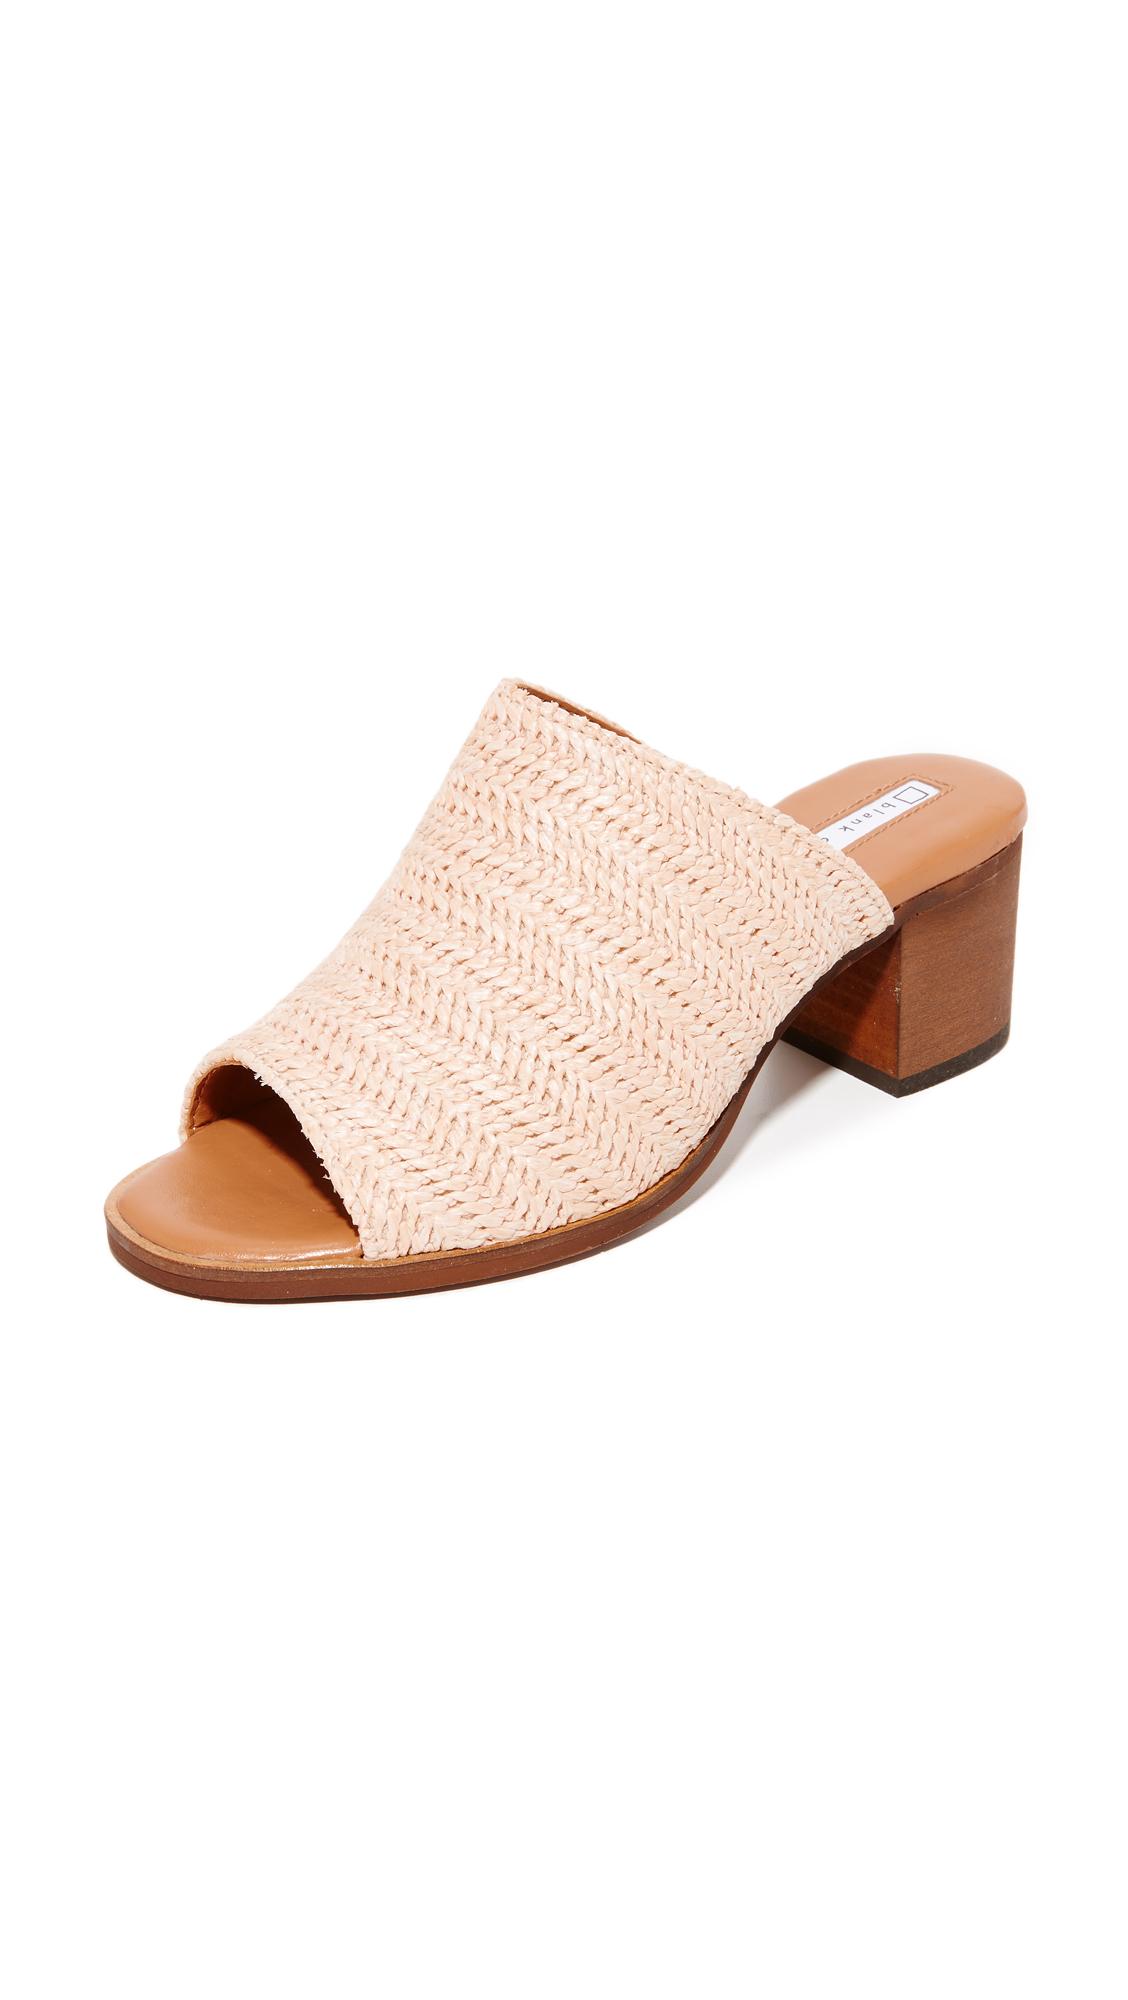 Blank Canvas Raffia City Mule Sandals - Alba at Shopbop